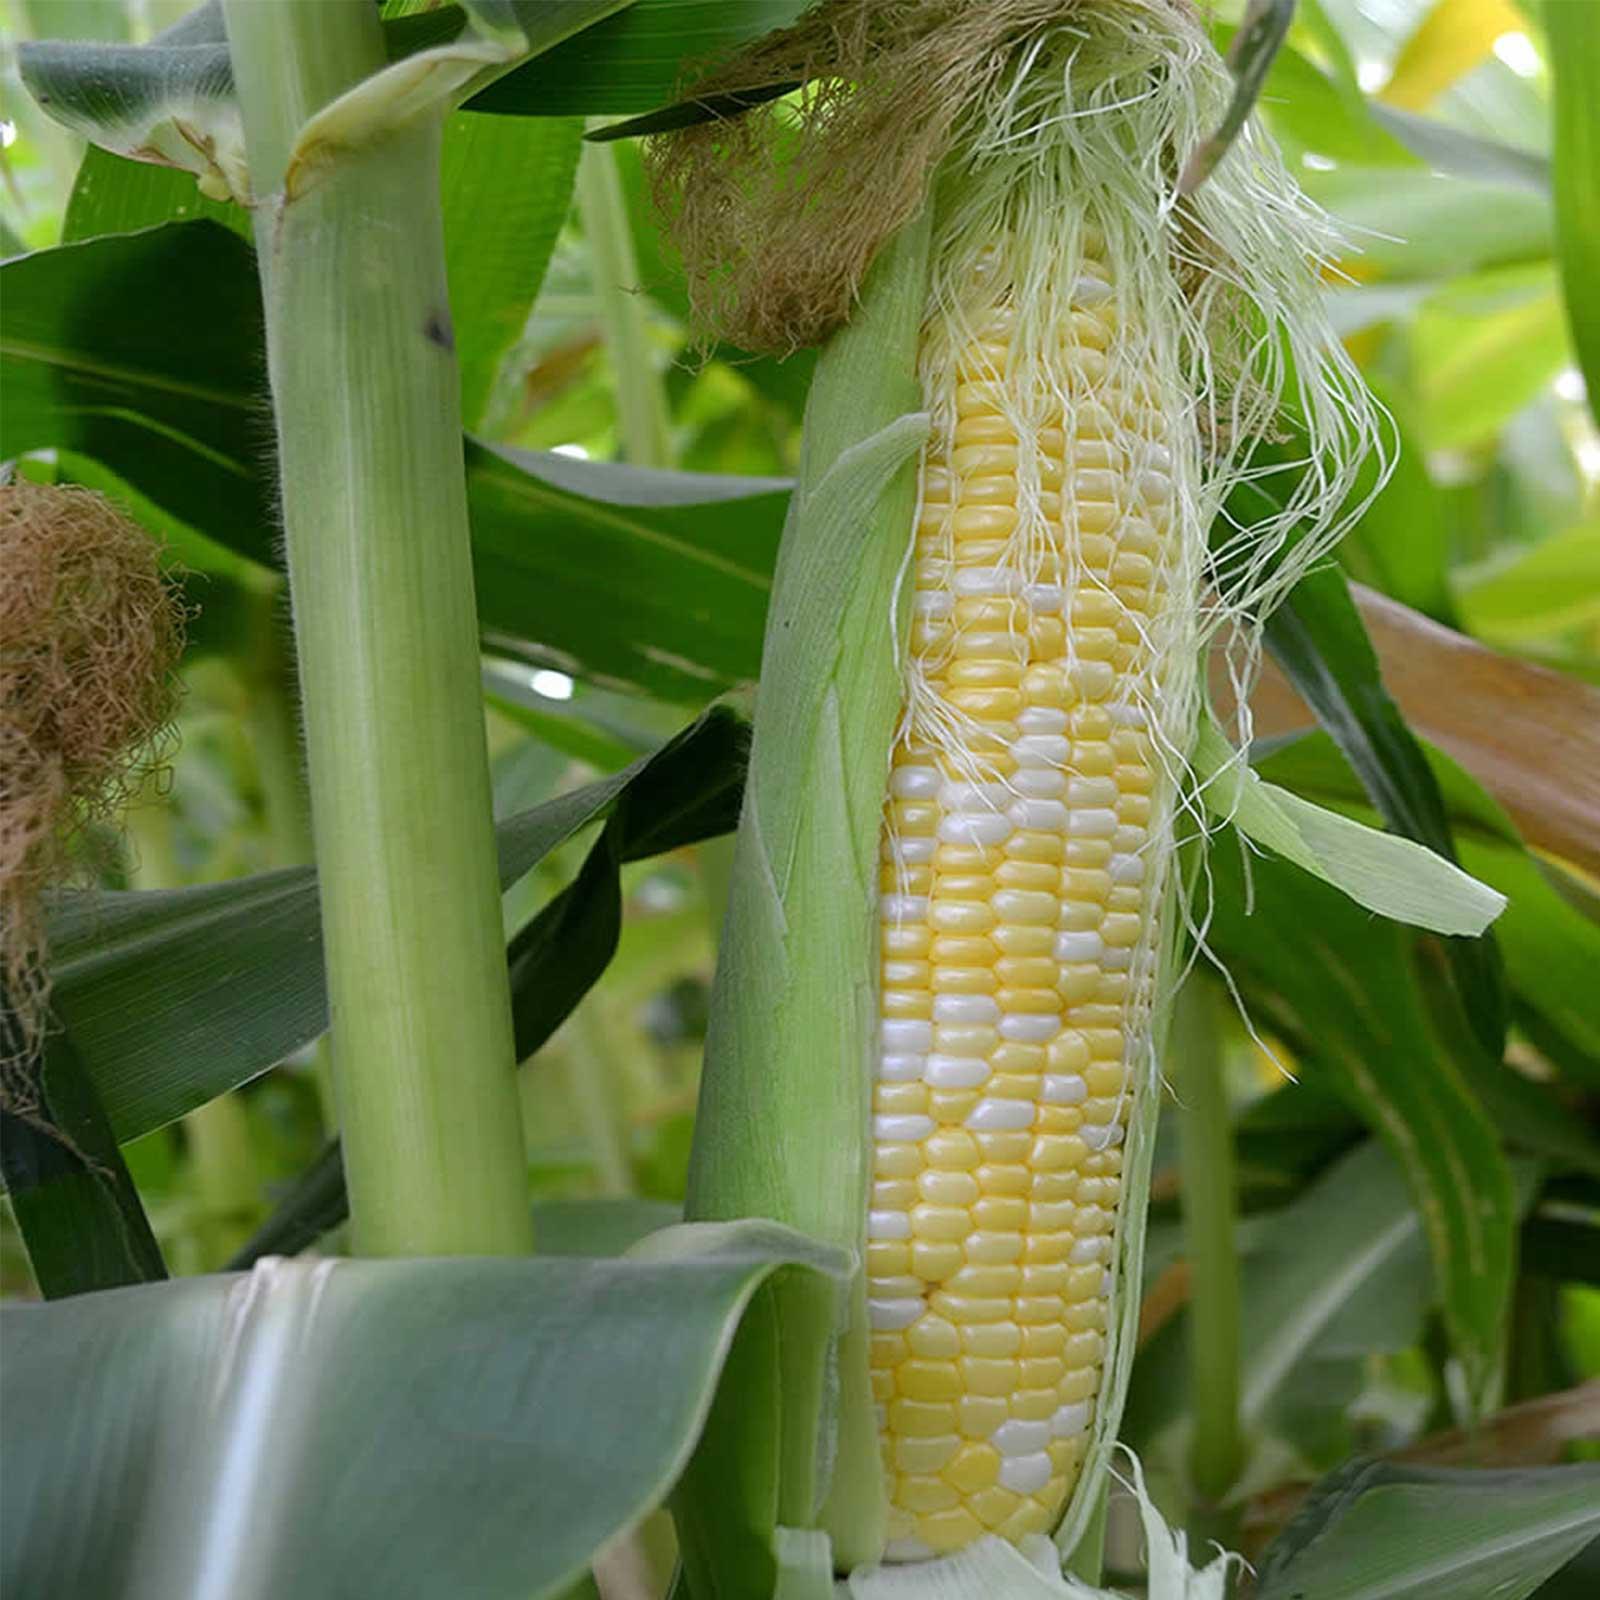 Peaches & Cream Hybrid Corn Garden Seeds - 50 Lb Bulk - Non-GMO Vegetable Gardening Seeds - Yellow & White Sweet (SE) Corn Kernels